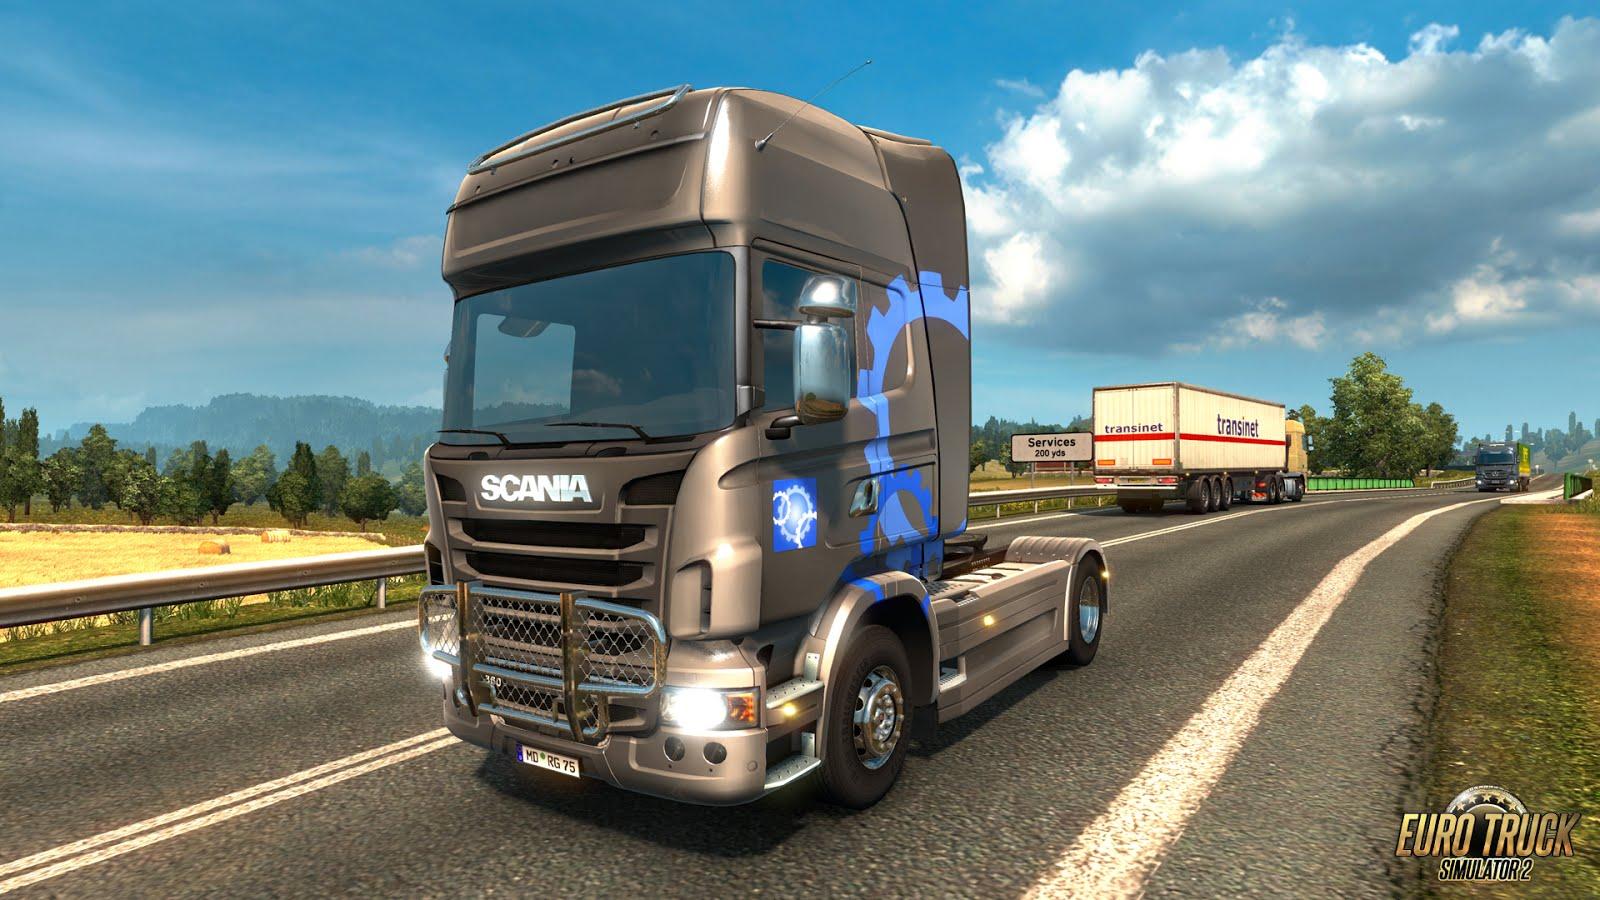 scs blog euro truck simulator 2 company paintjobs. Black Bedroom Furniture Sets. Home Design Ideas